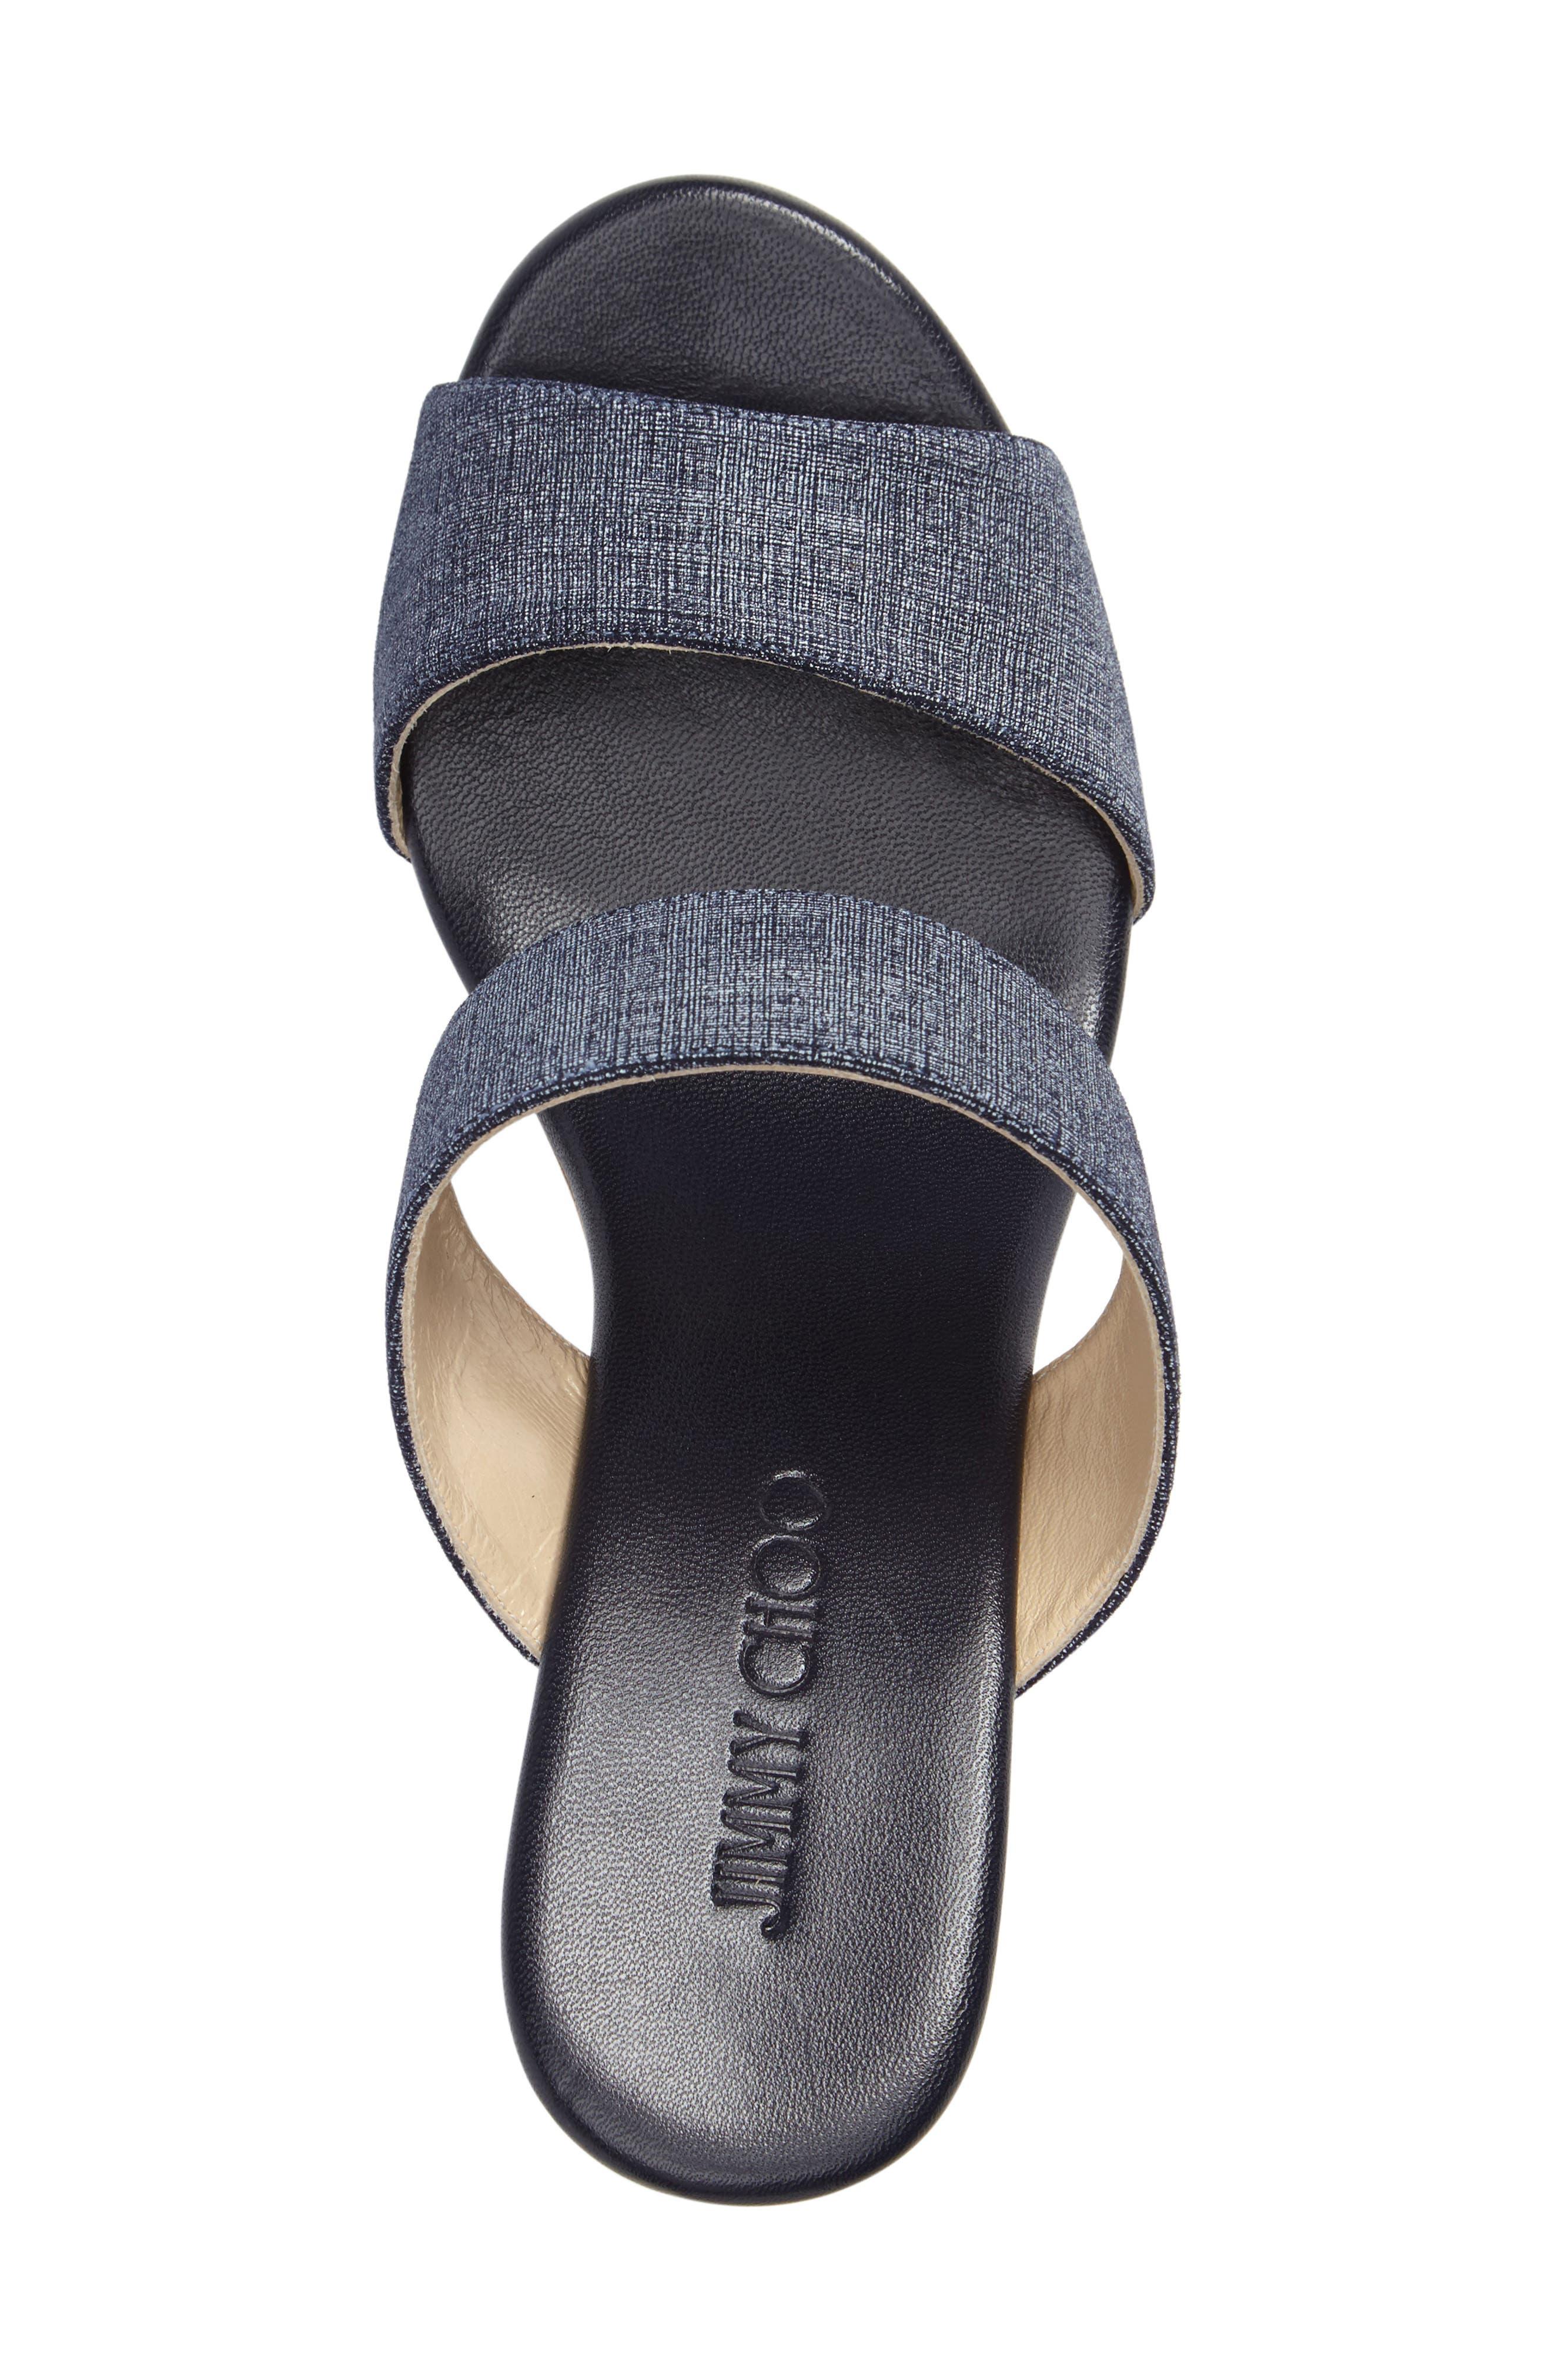 Parker Wedge Sandal,                             Alternate thumbnail 12, color,